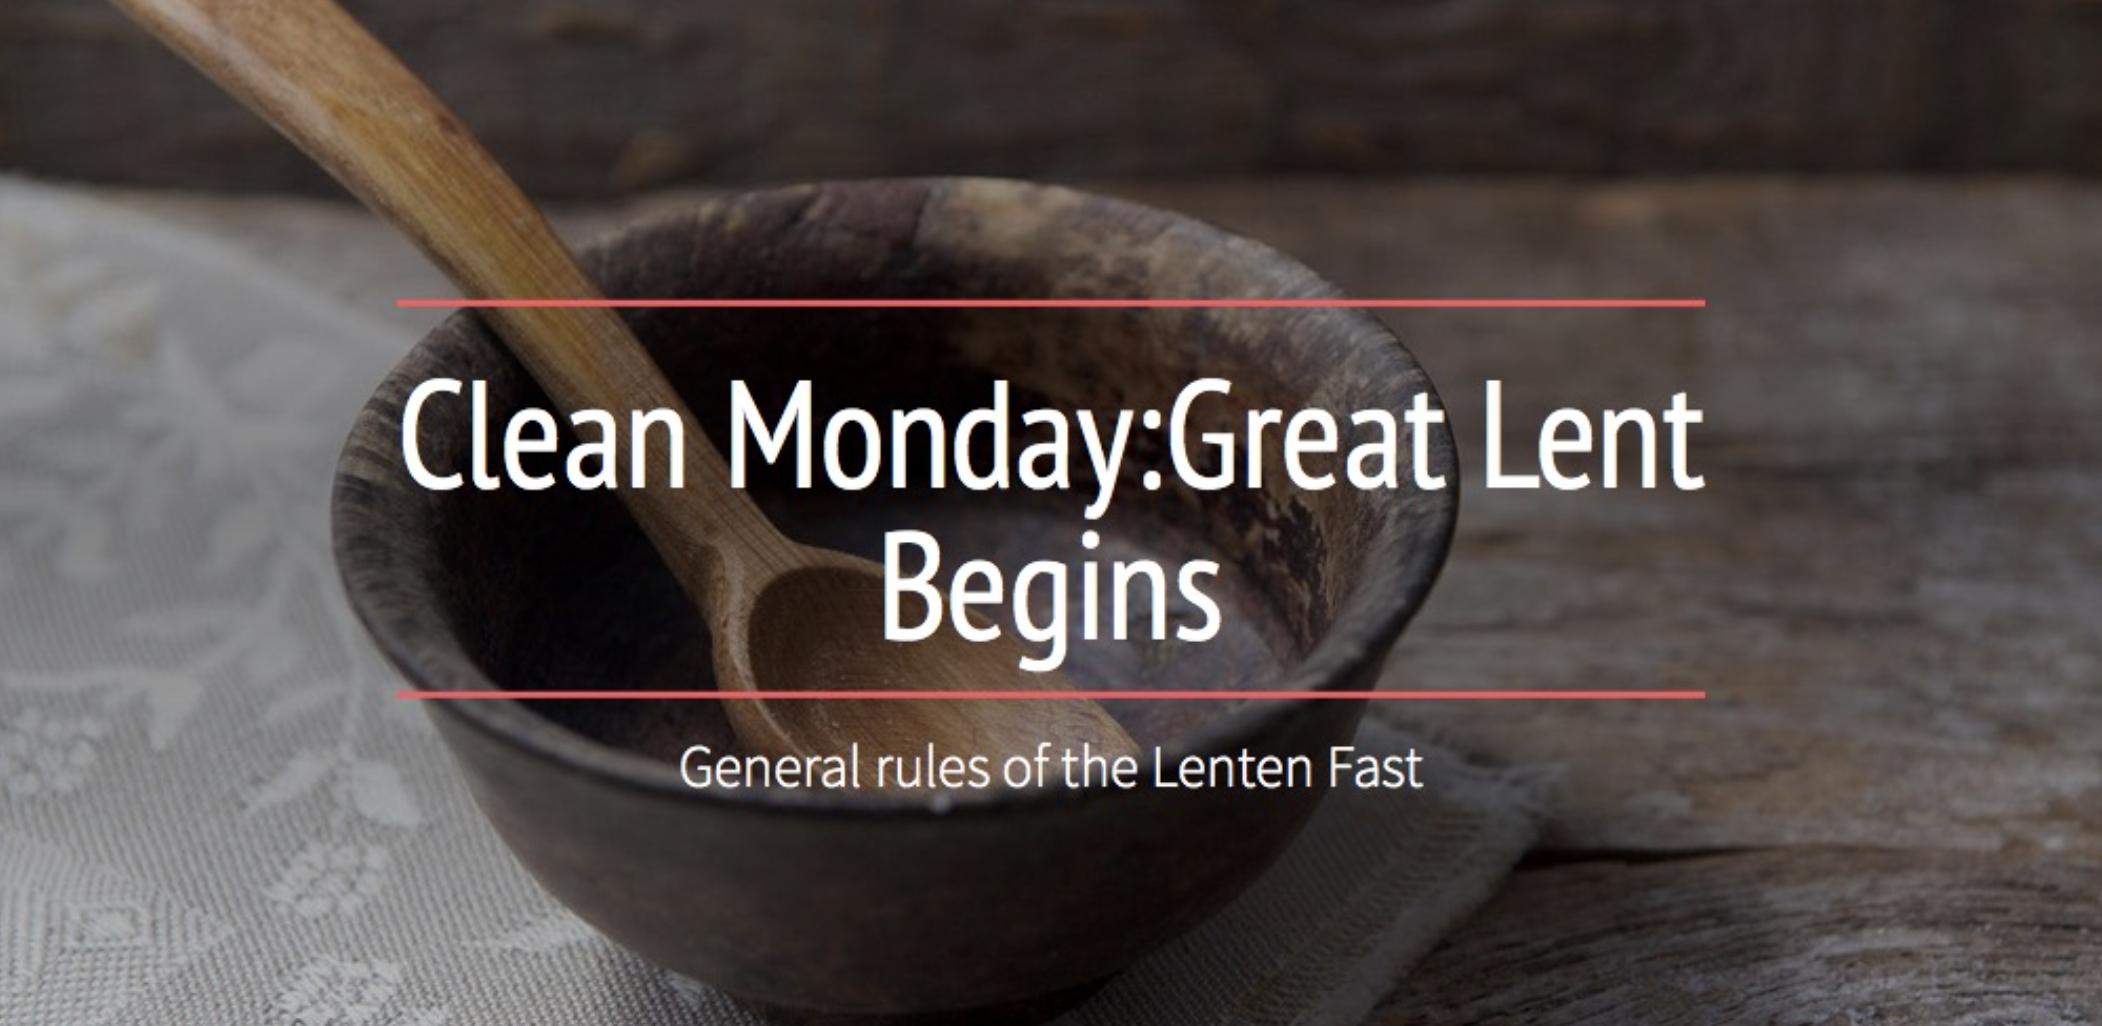 Clean Monday: Great Lent Begins